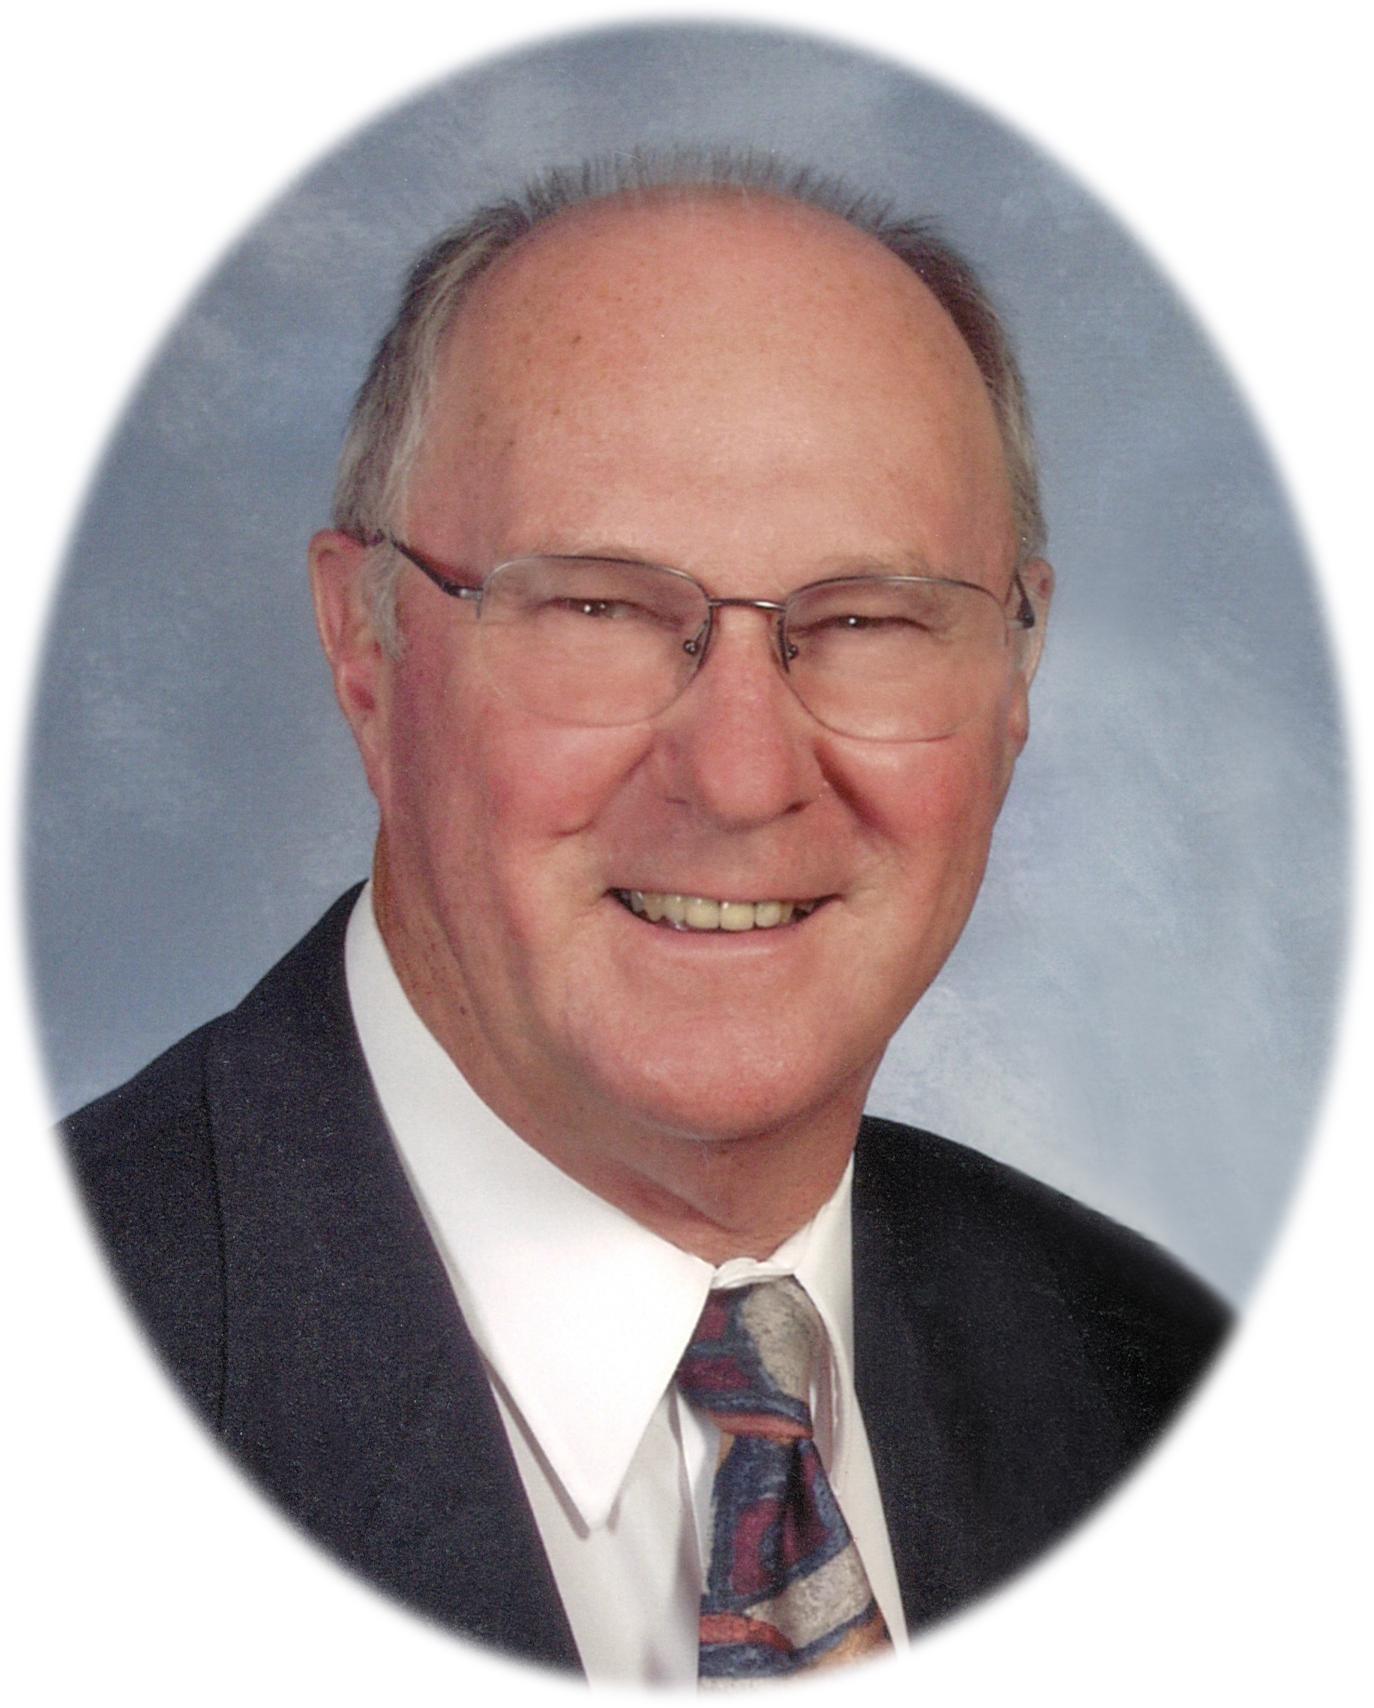 Larry W. Braga